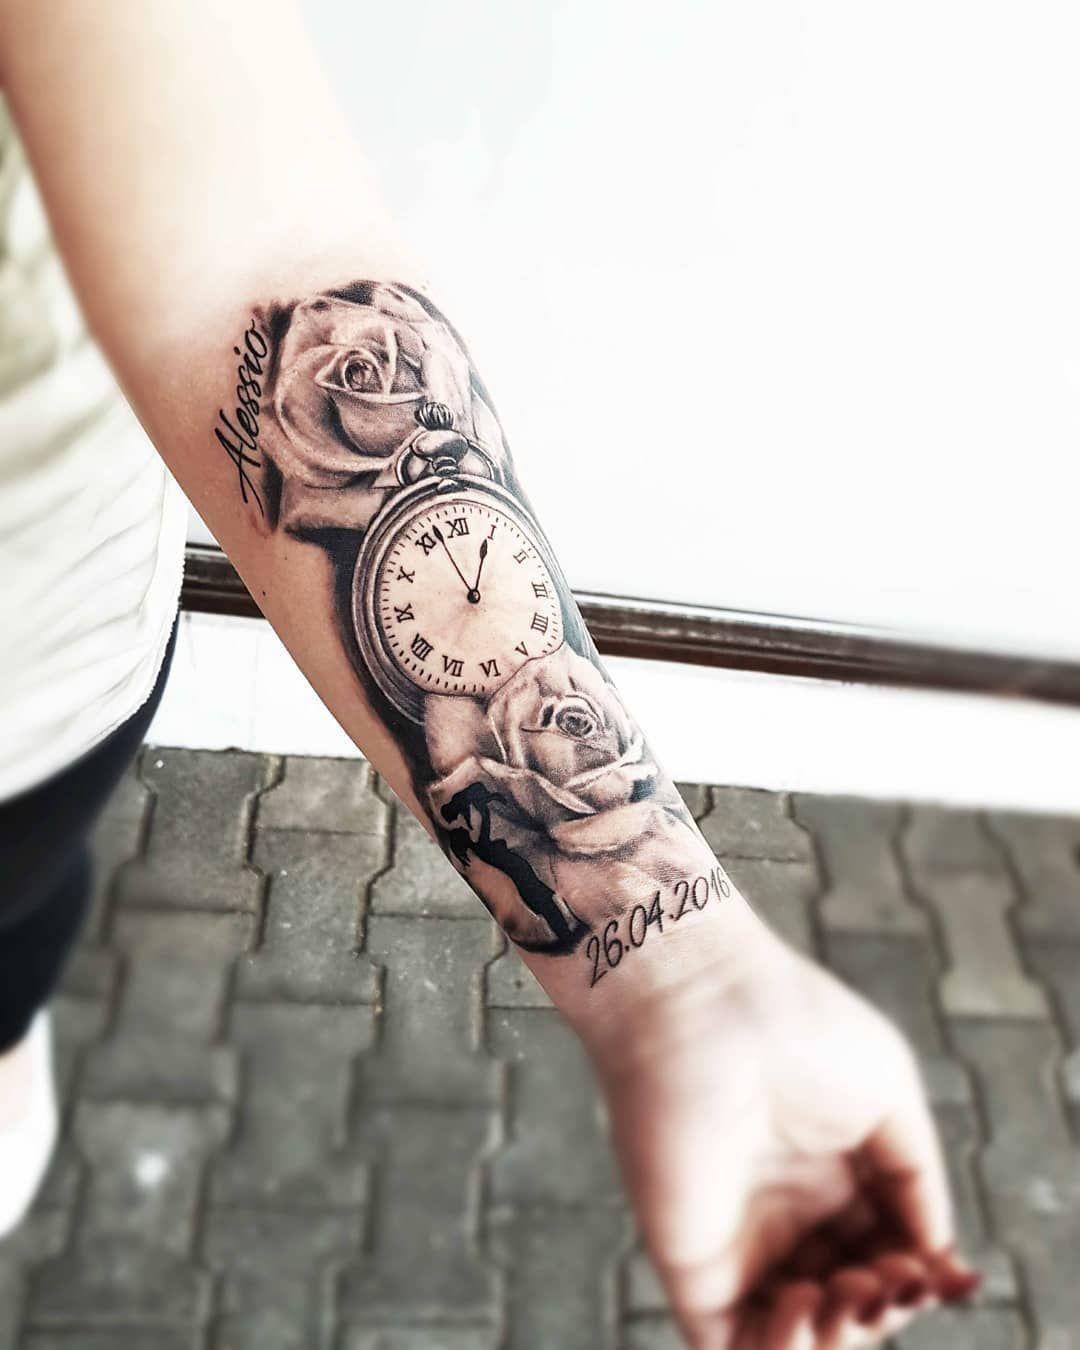 Cool forearm tattoos 202450945735728450